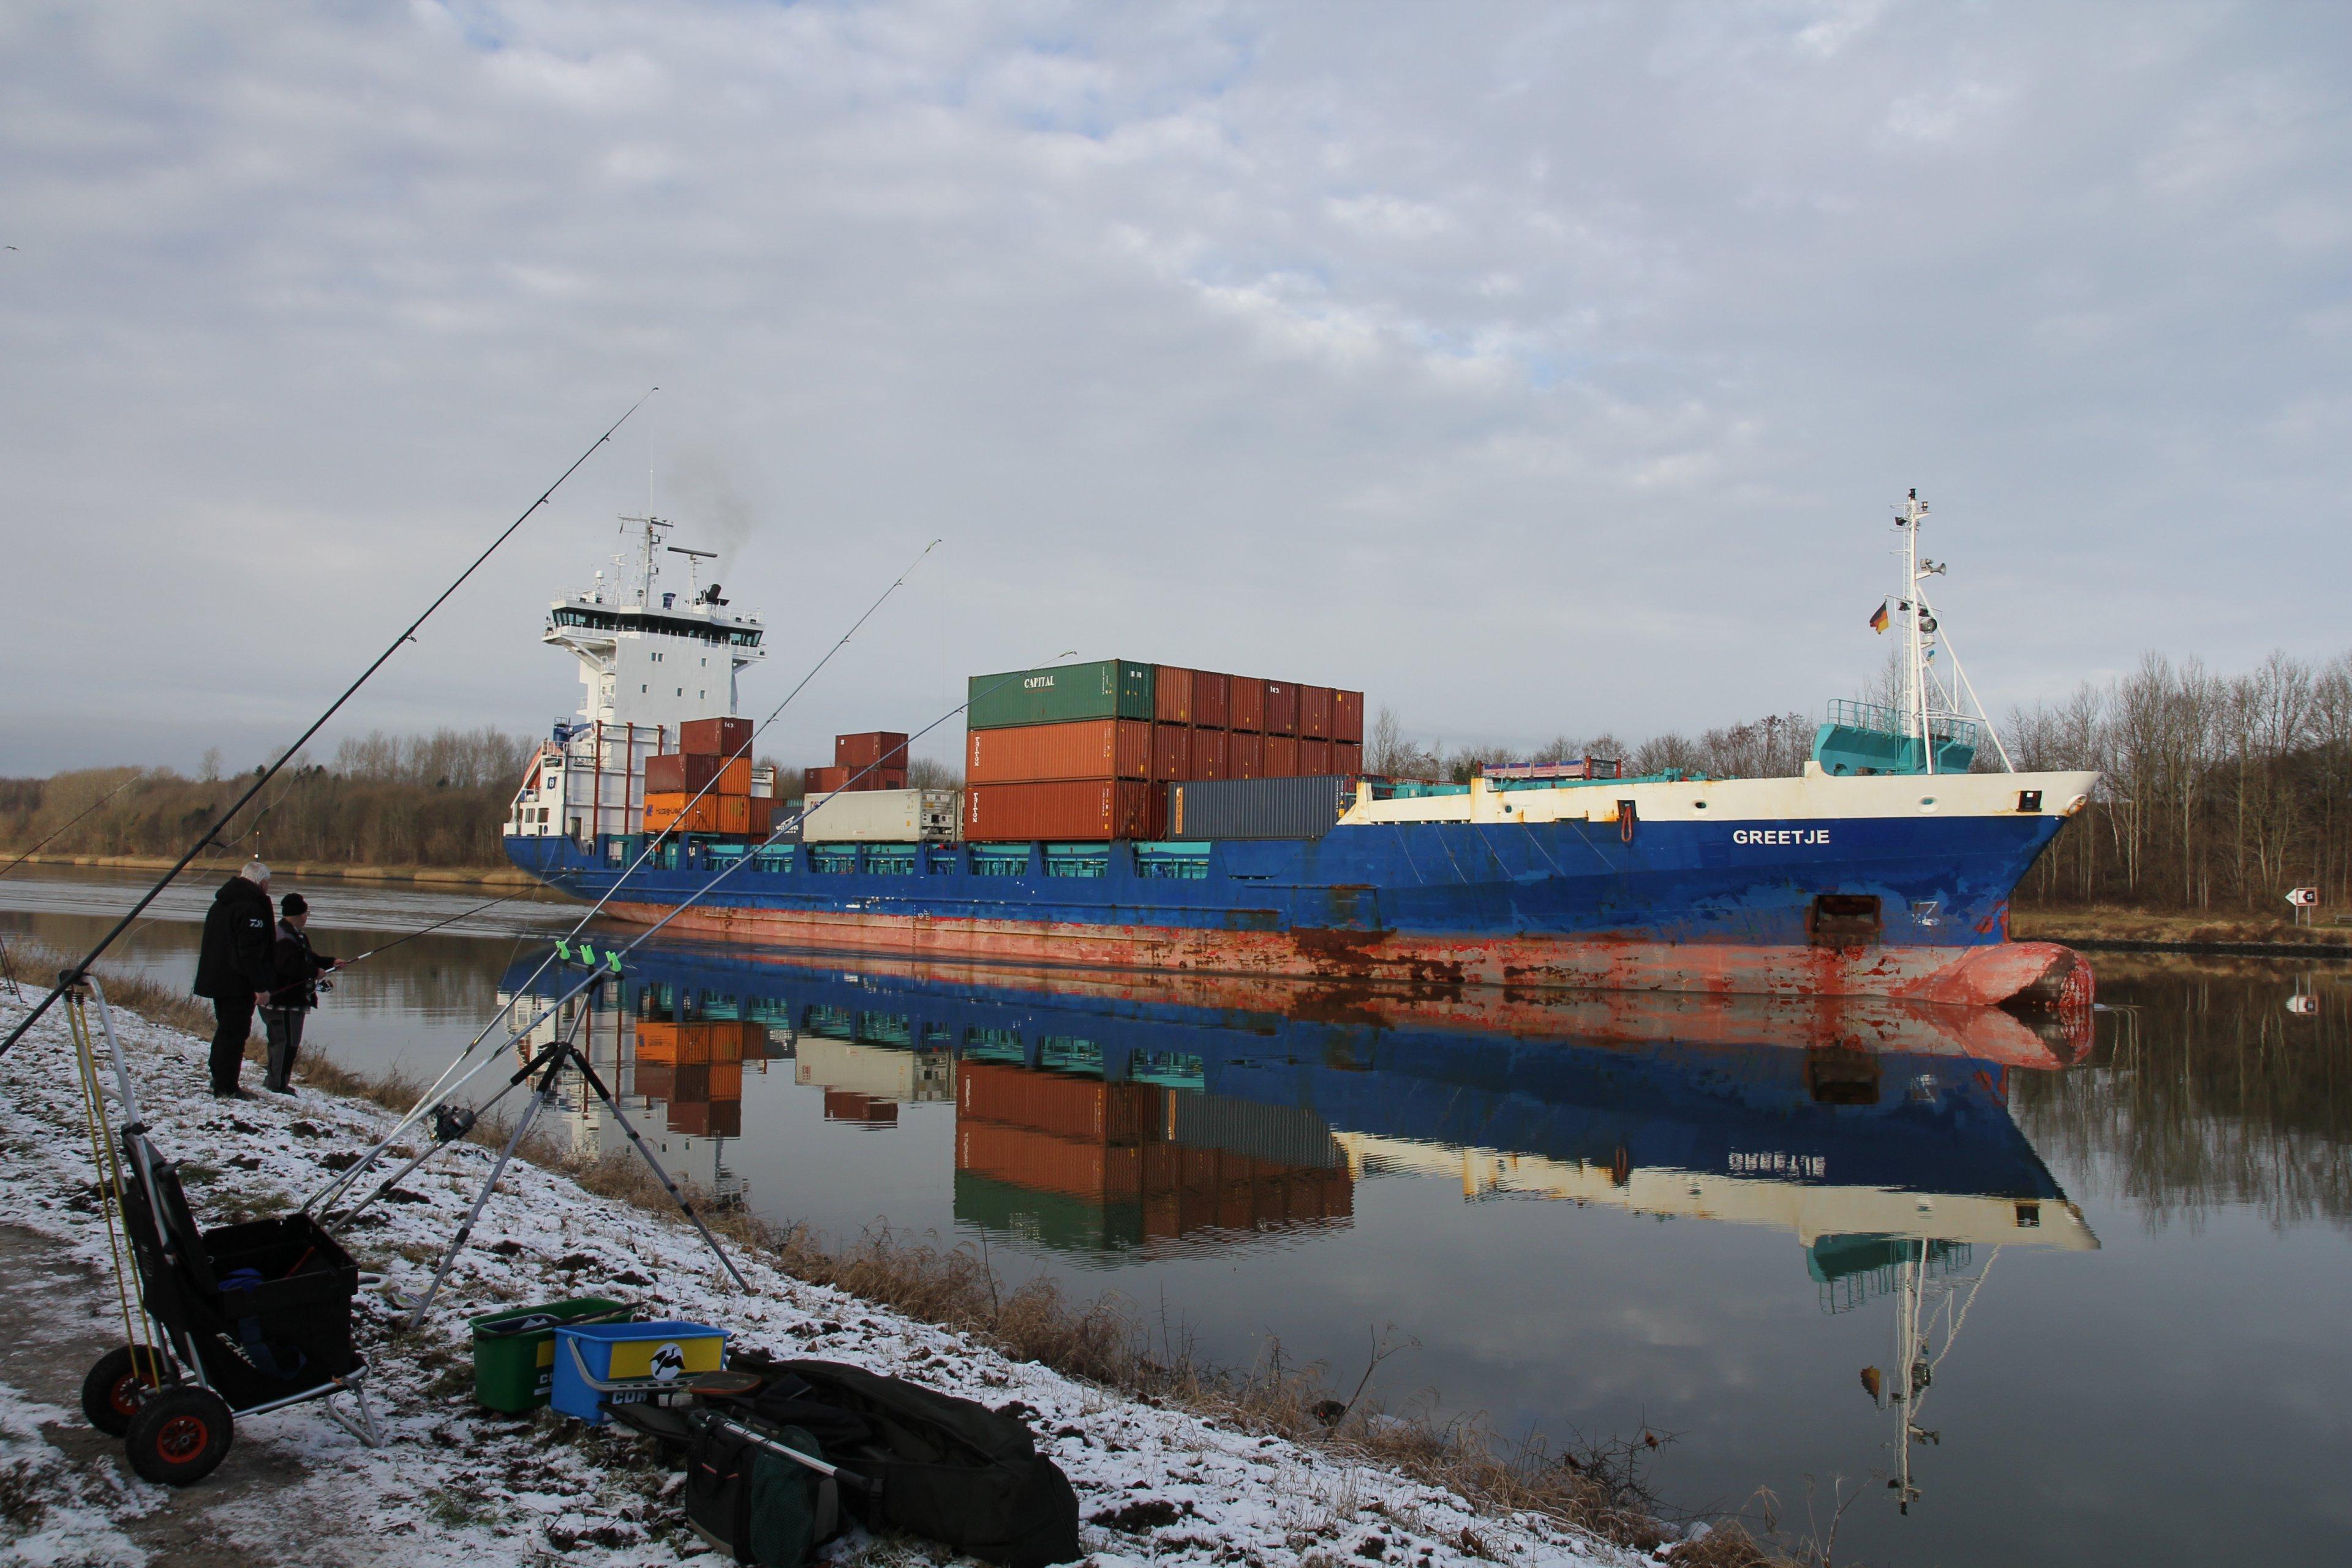 6_Plattfischangeln_Nord-Ostsee-Kanal.JPG